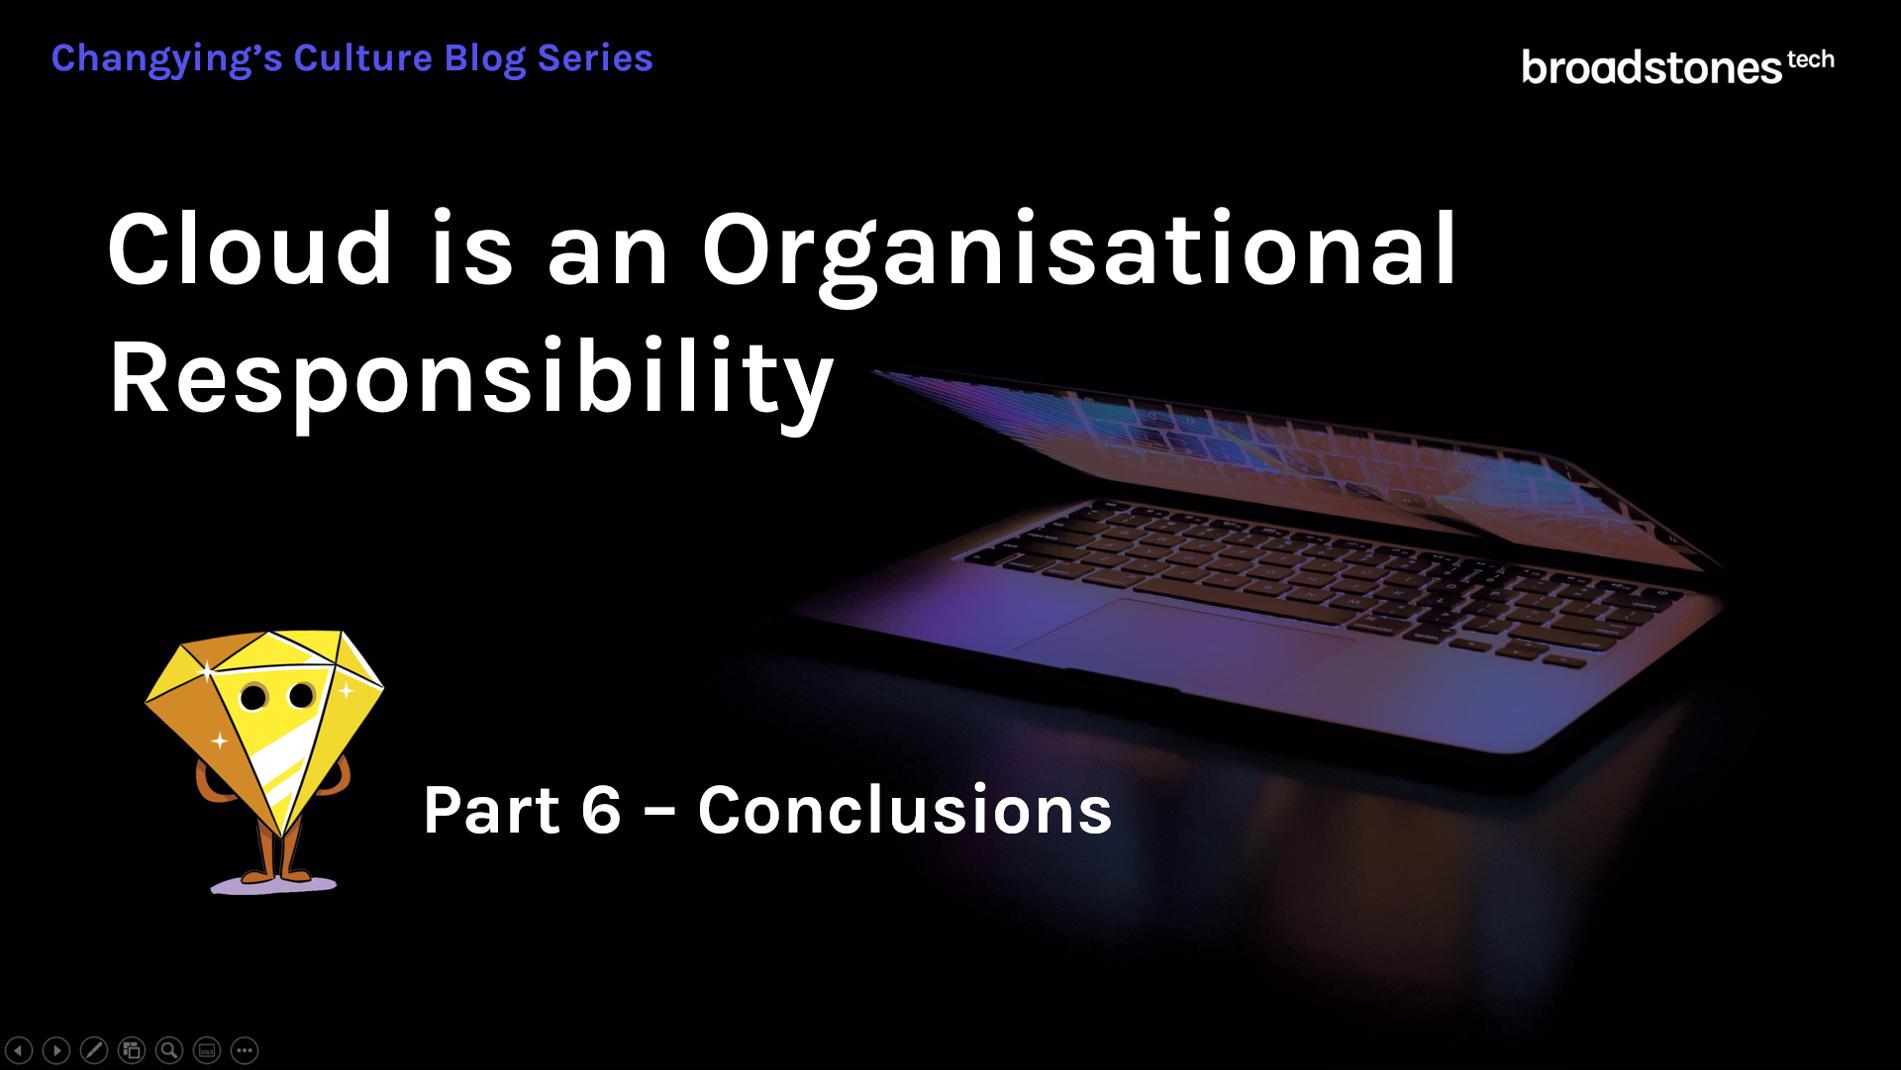 Cloud is an organisational responsibility - part 6 - conclusions - focus on cloud utilisation